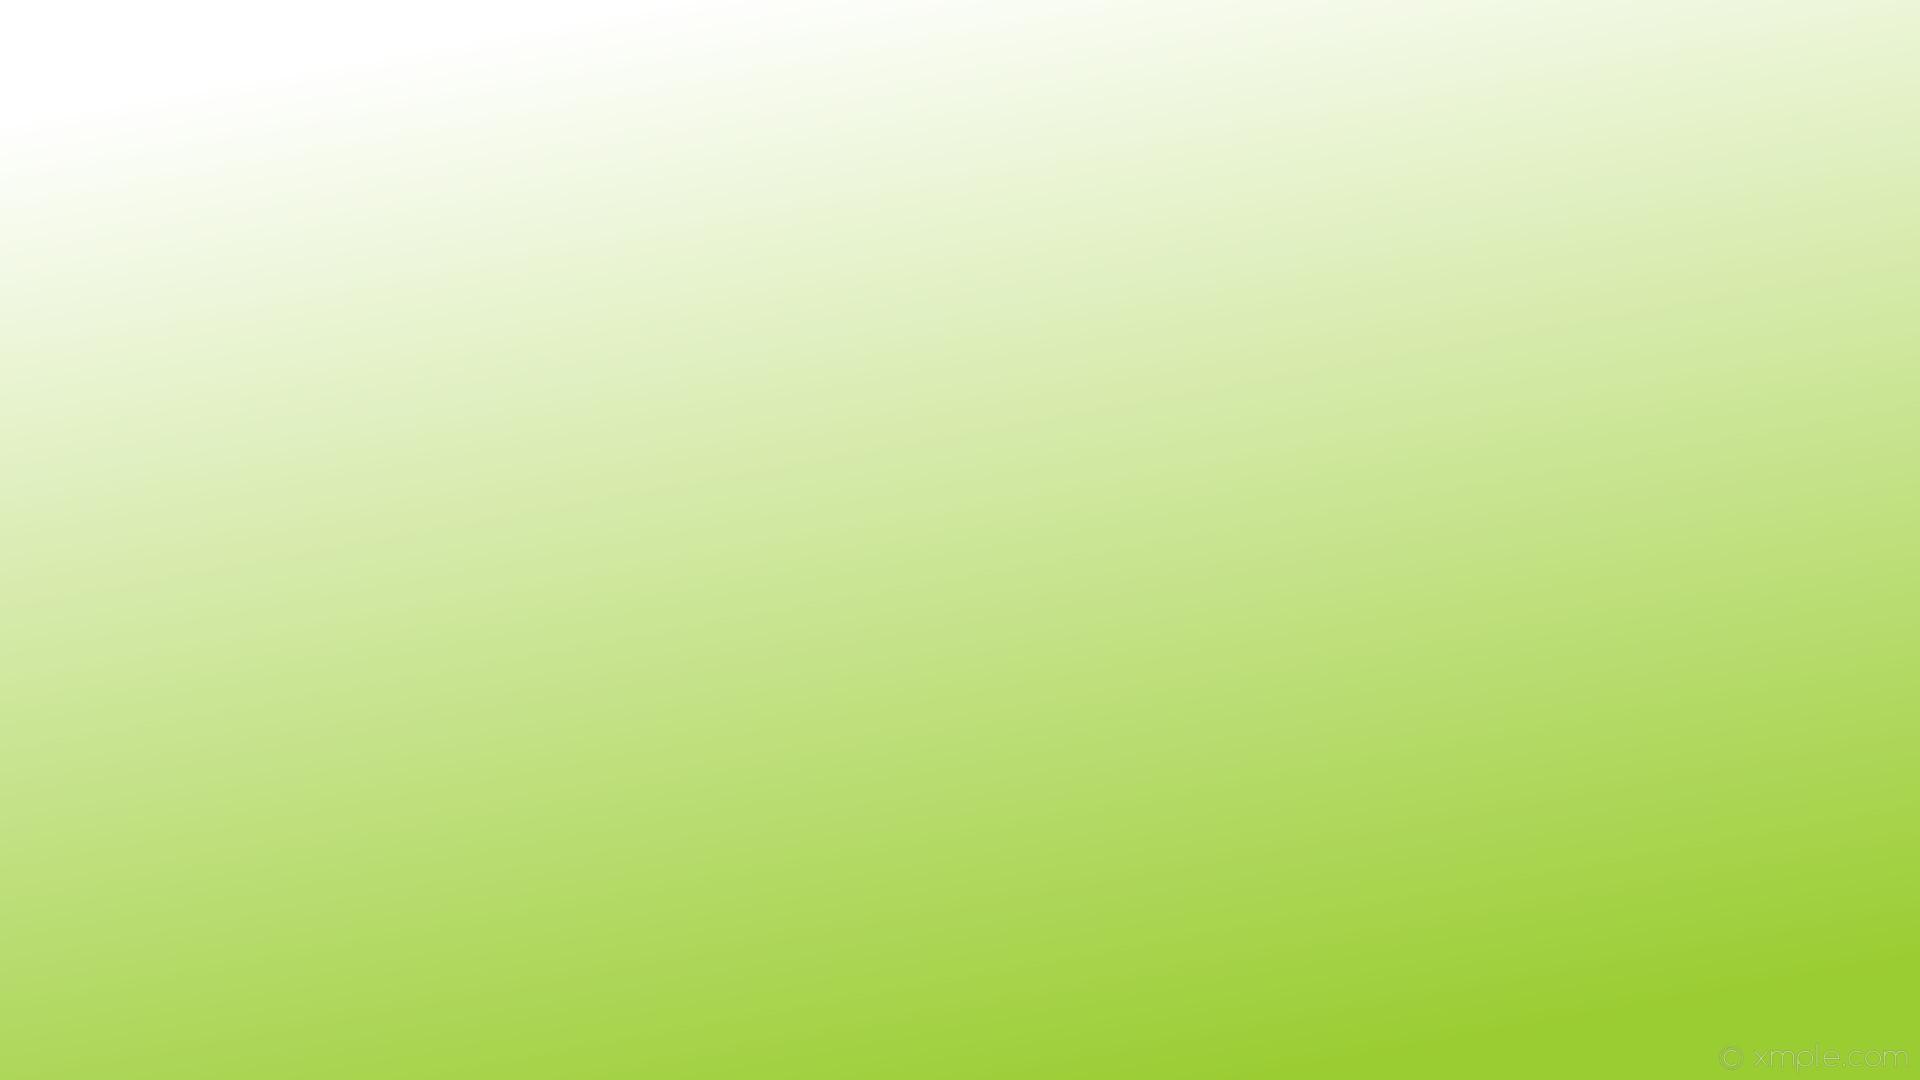 wallpaper linear green gradient white yellow green #9acd32 #ffffff 300°